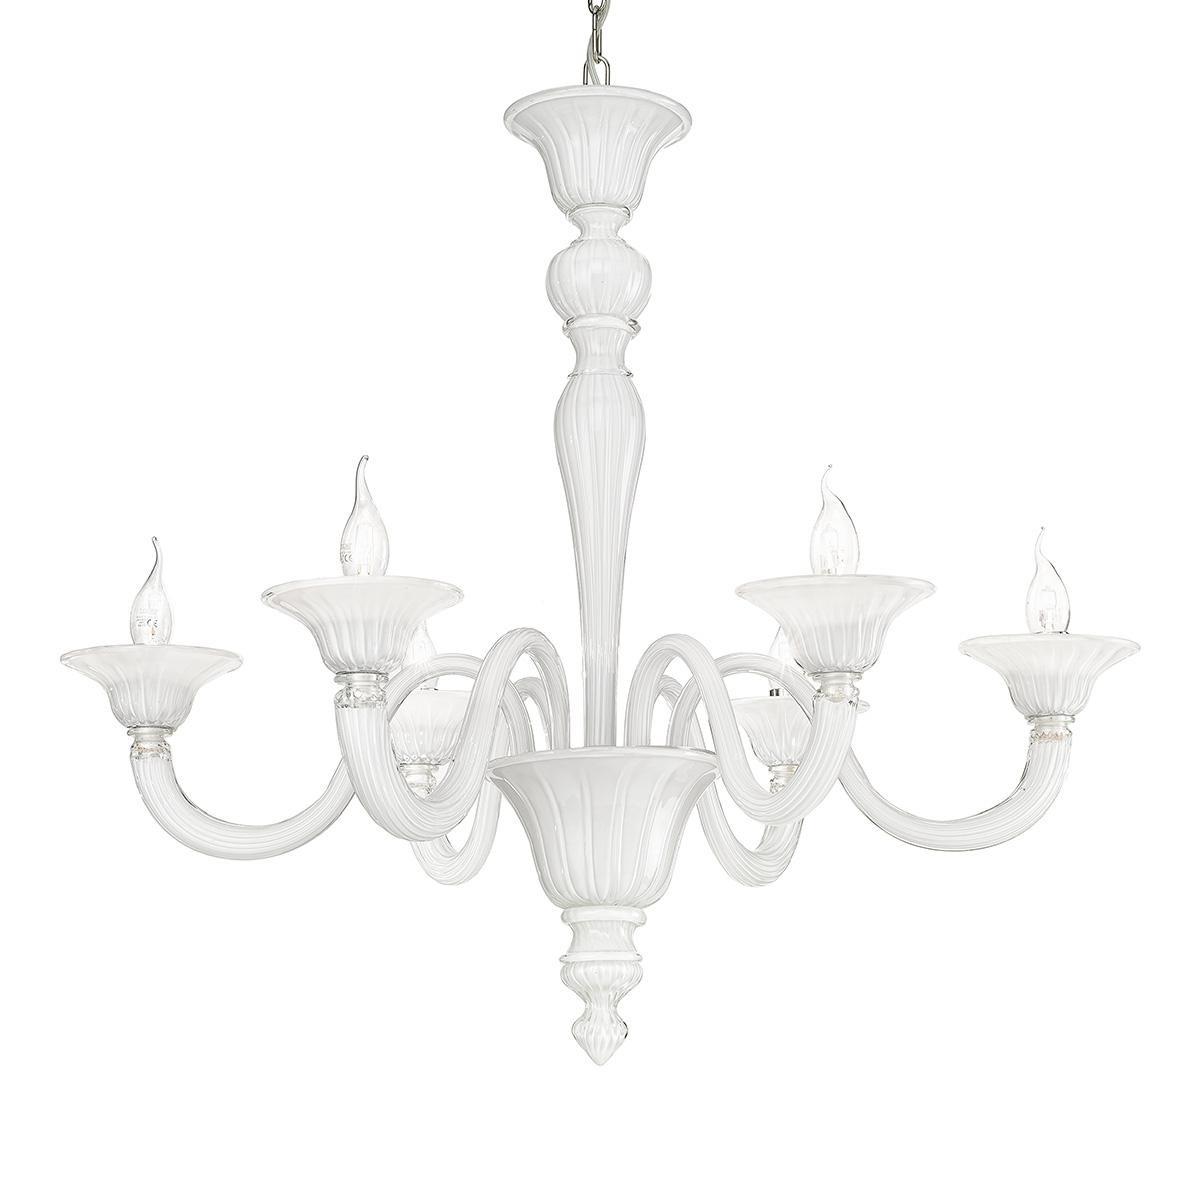 """Paola"" Murano glass chandelier - 6 lights - white"